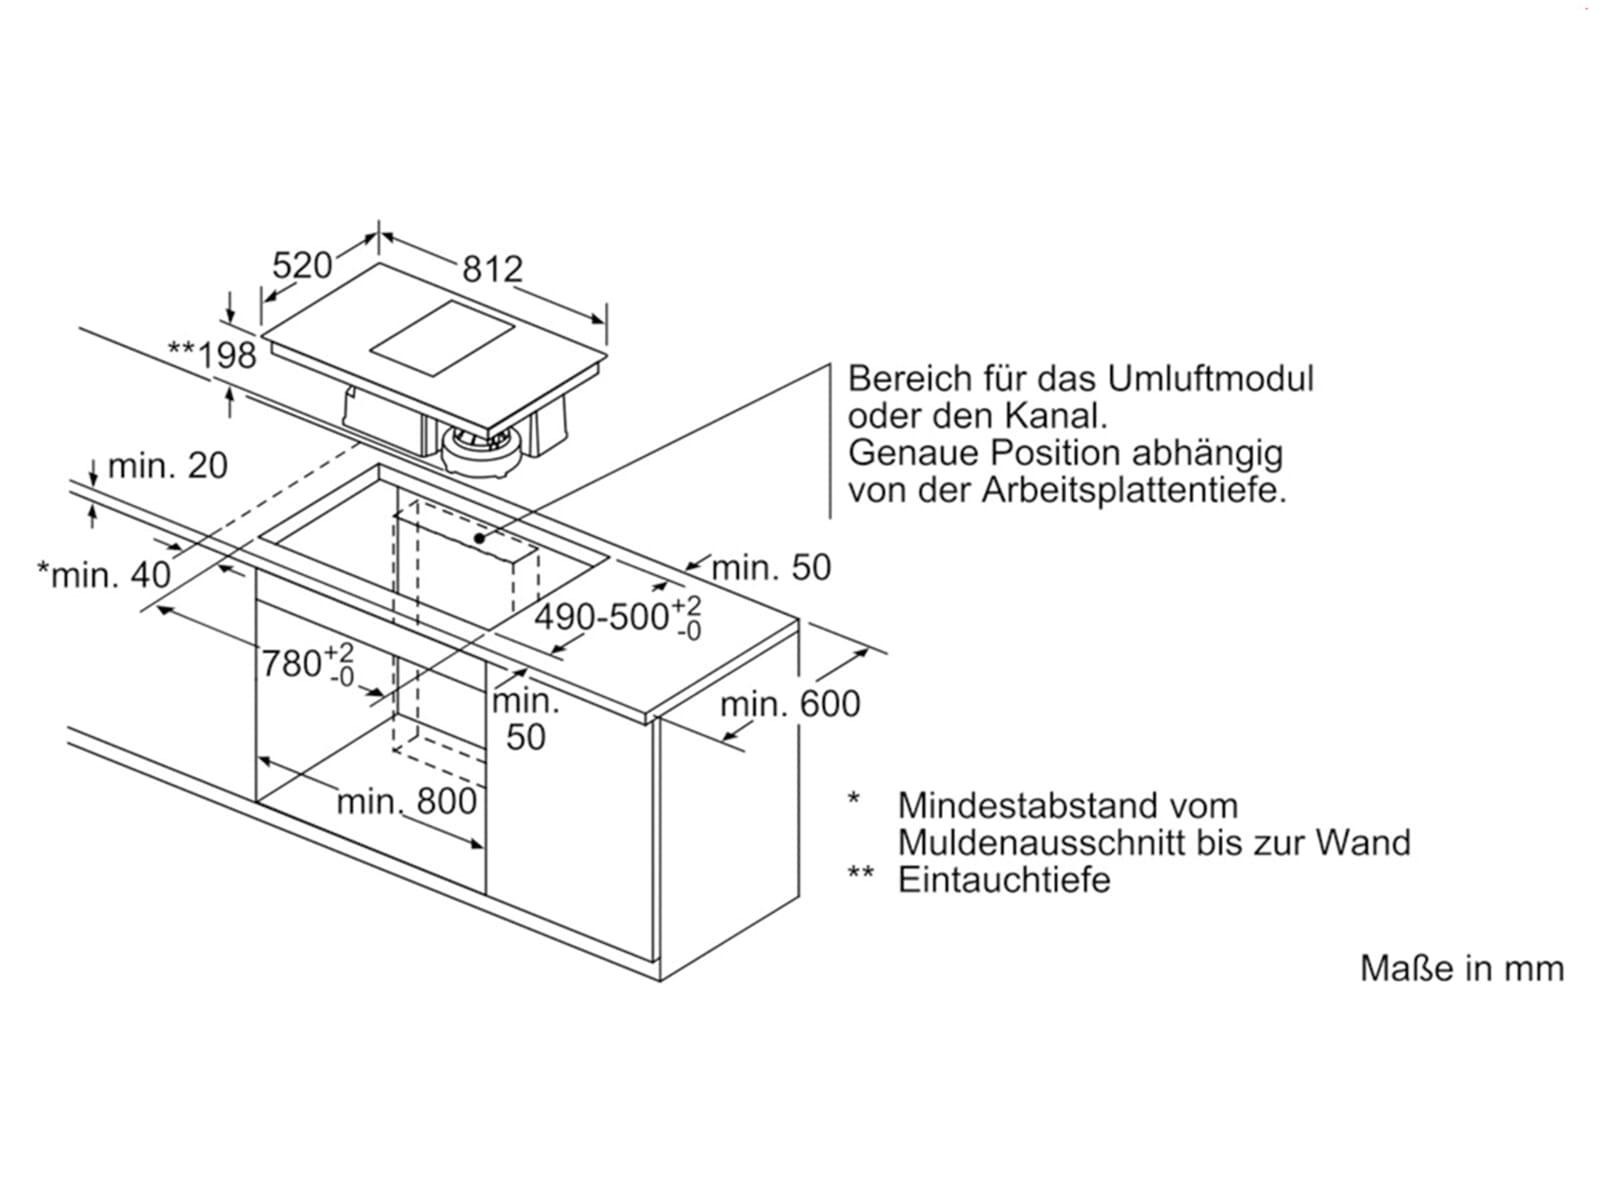 siemens ex875lx34e induktionskochfeld kochfeldabzug. Black Bedroom Furniture Sets. Home Design Ideas